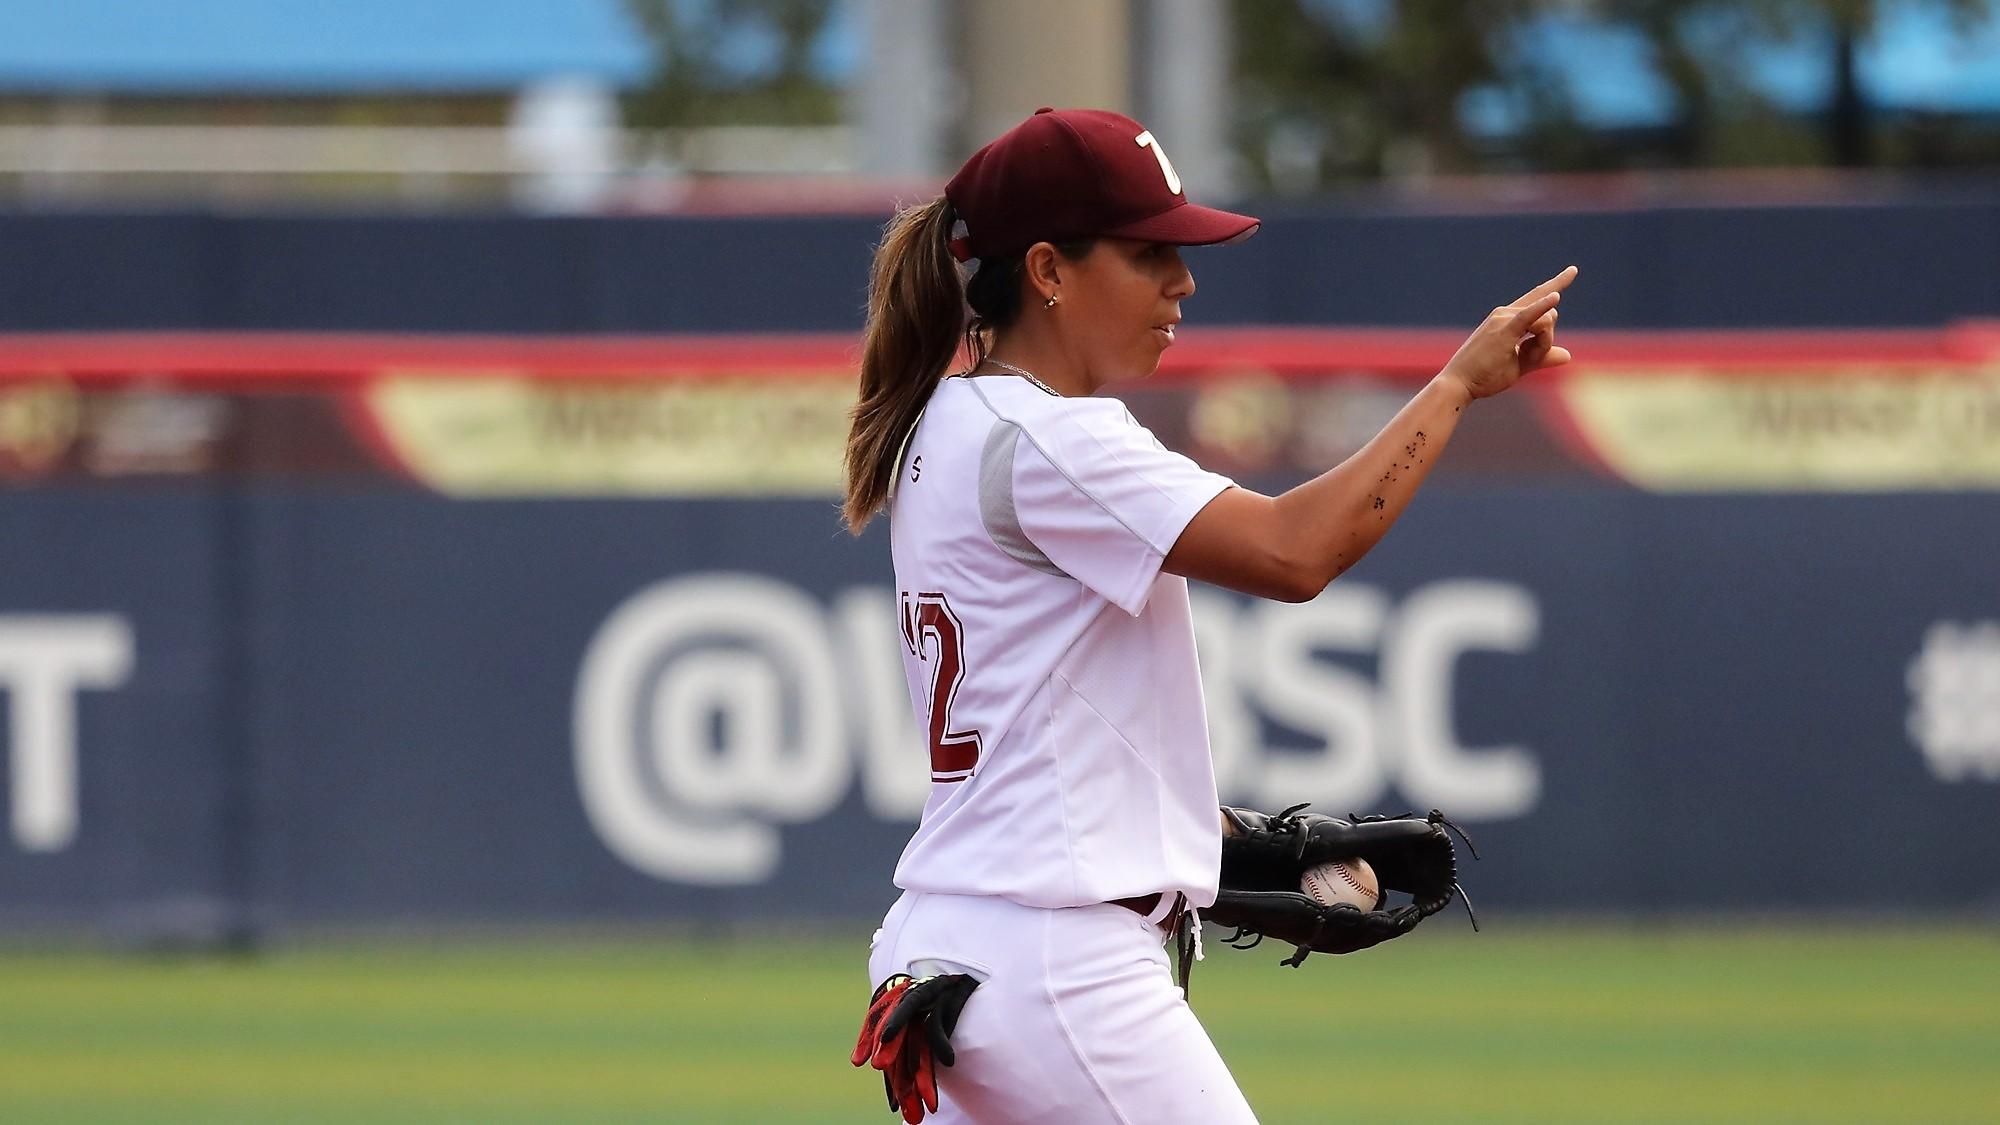 Sor Brito fielding the shortstop position